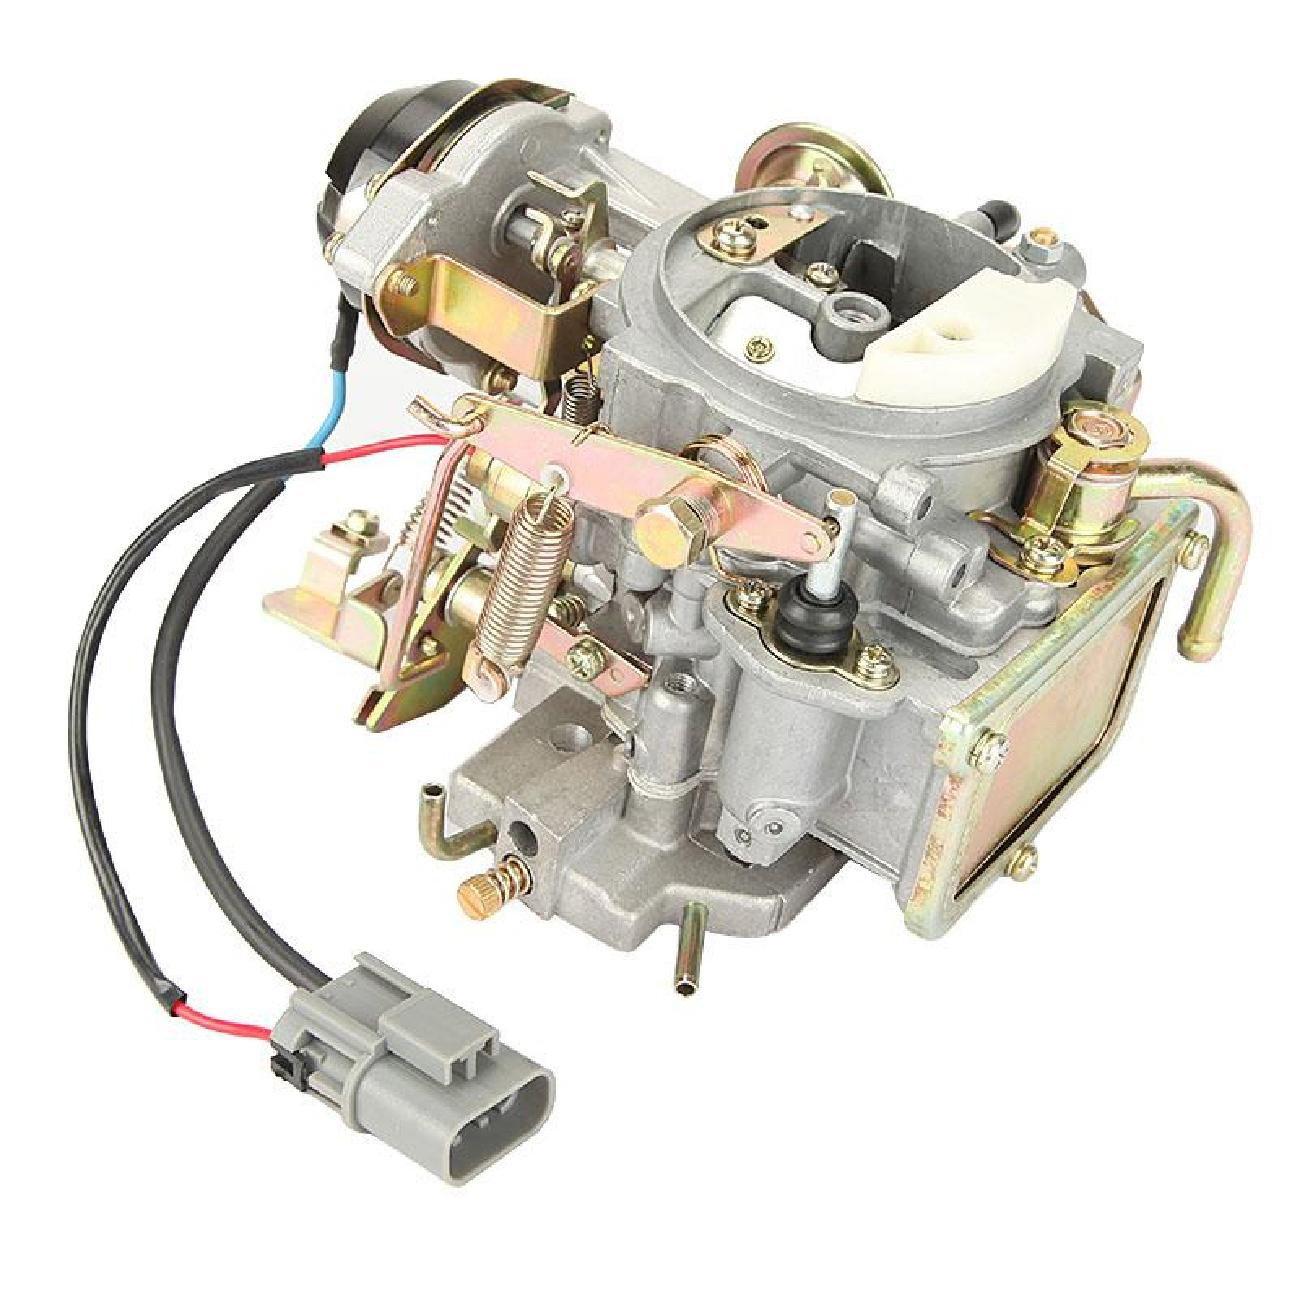 Amazoncom Alavente Carter Carburetor For Nissan 720 Pickup 24l